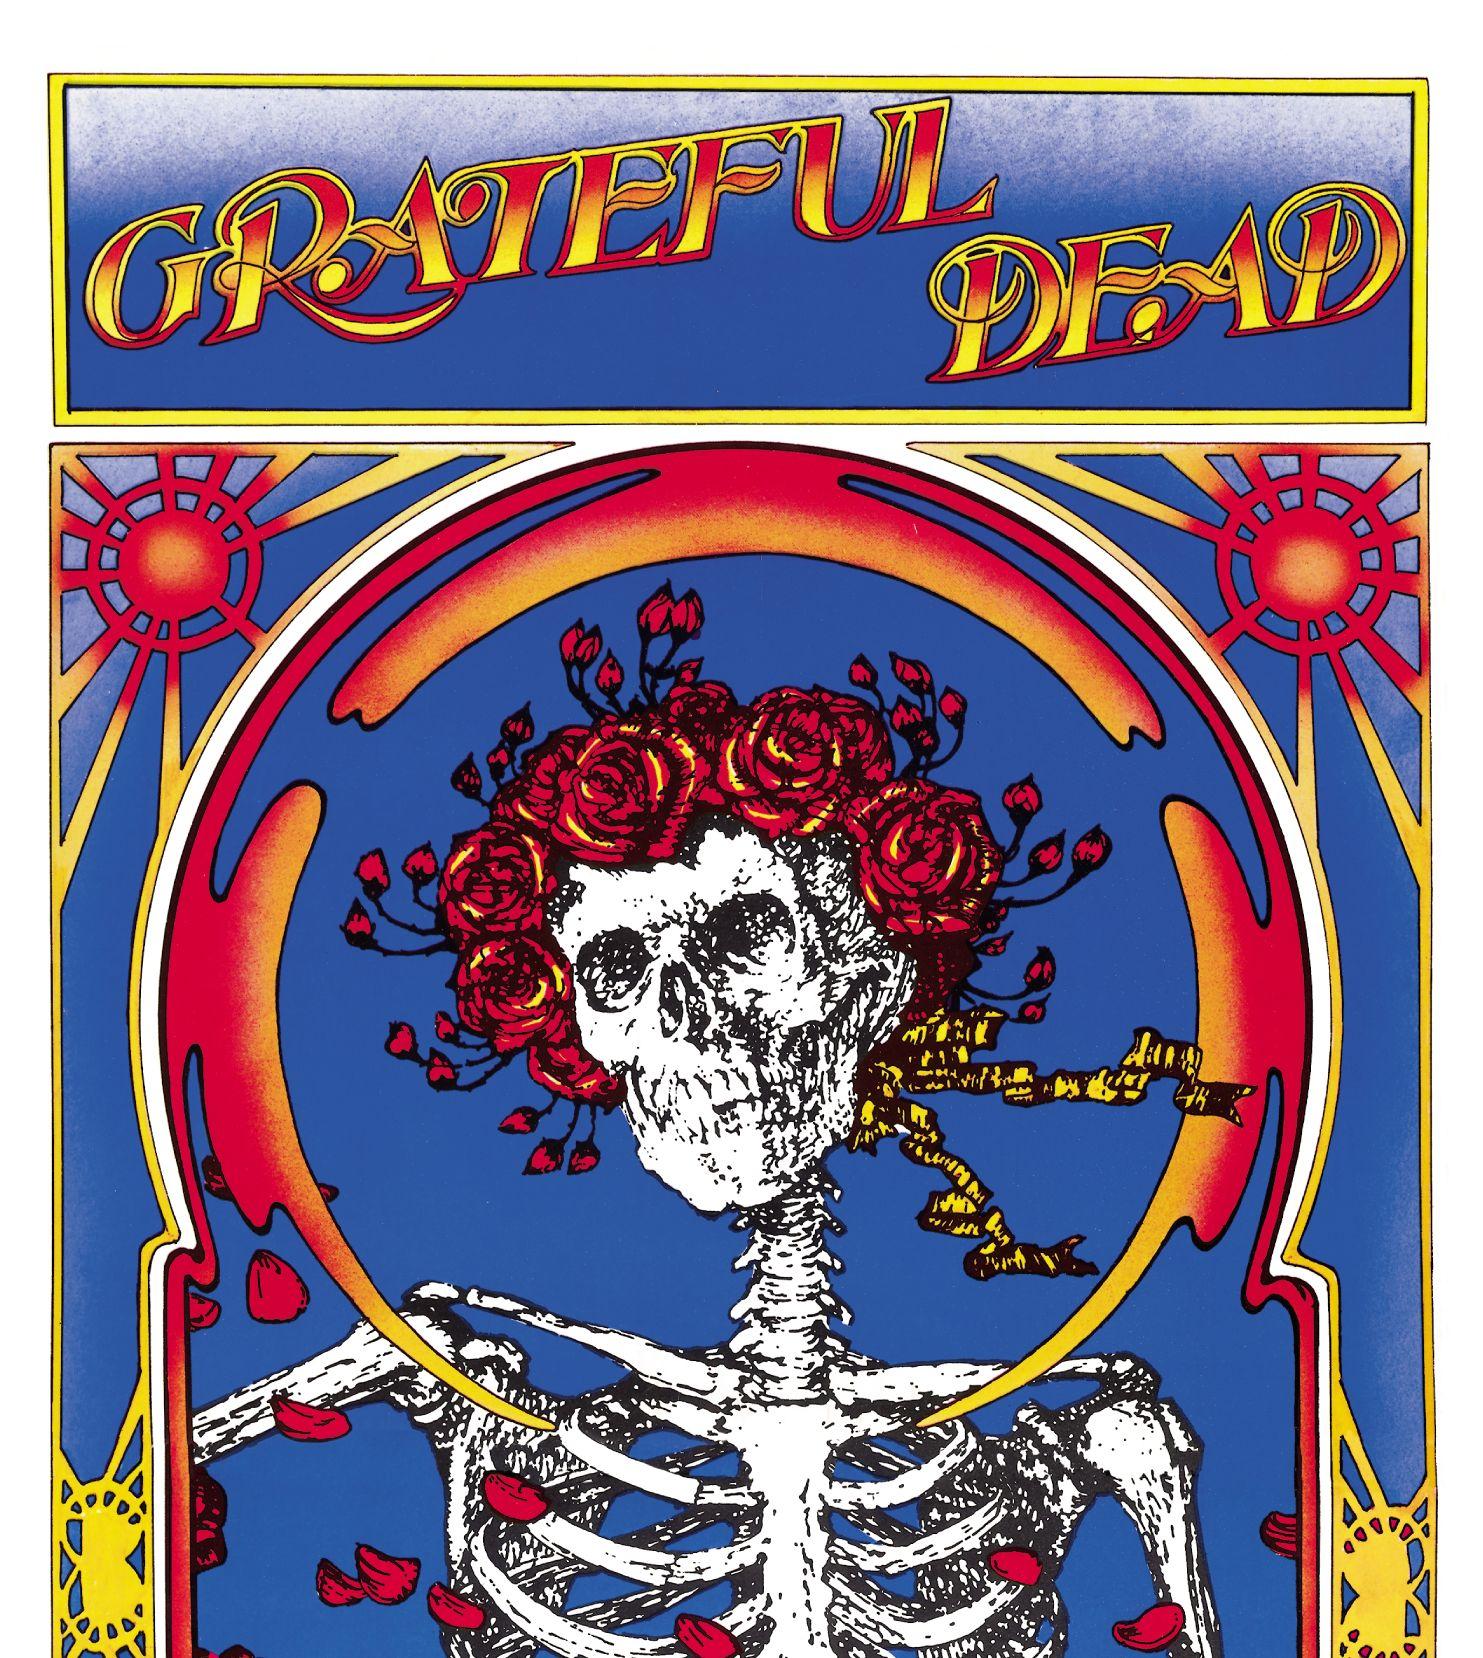 Grateful Dead Wallpapers Skeleton and Roses Wallpaper 1483x1658